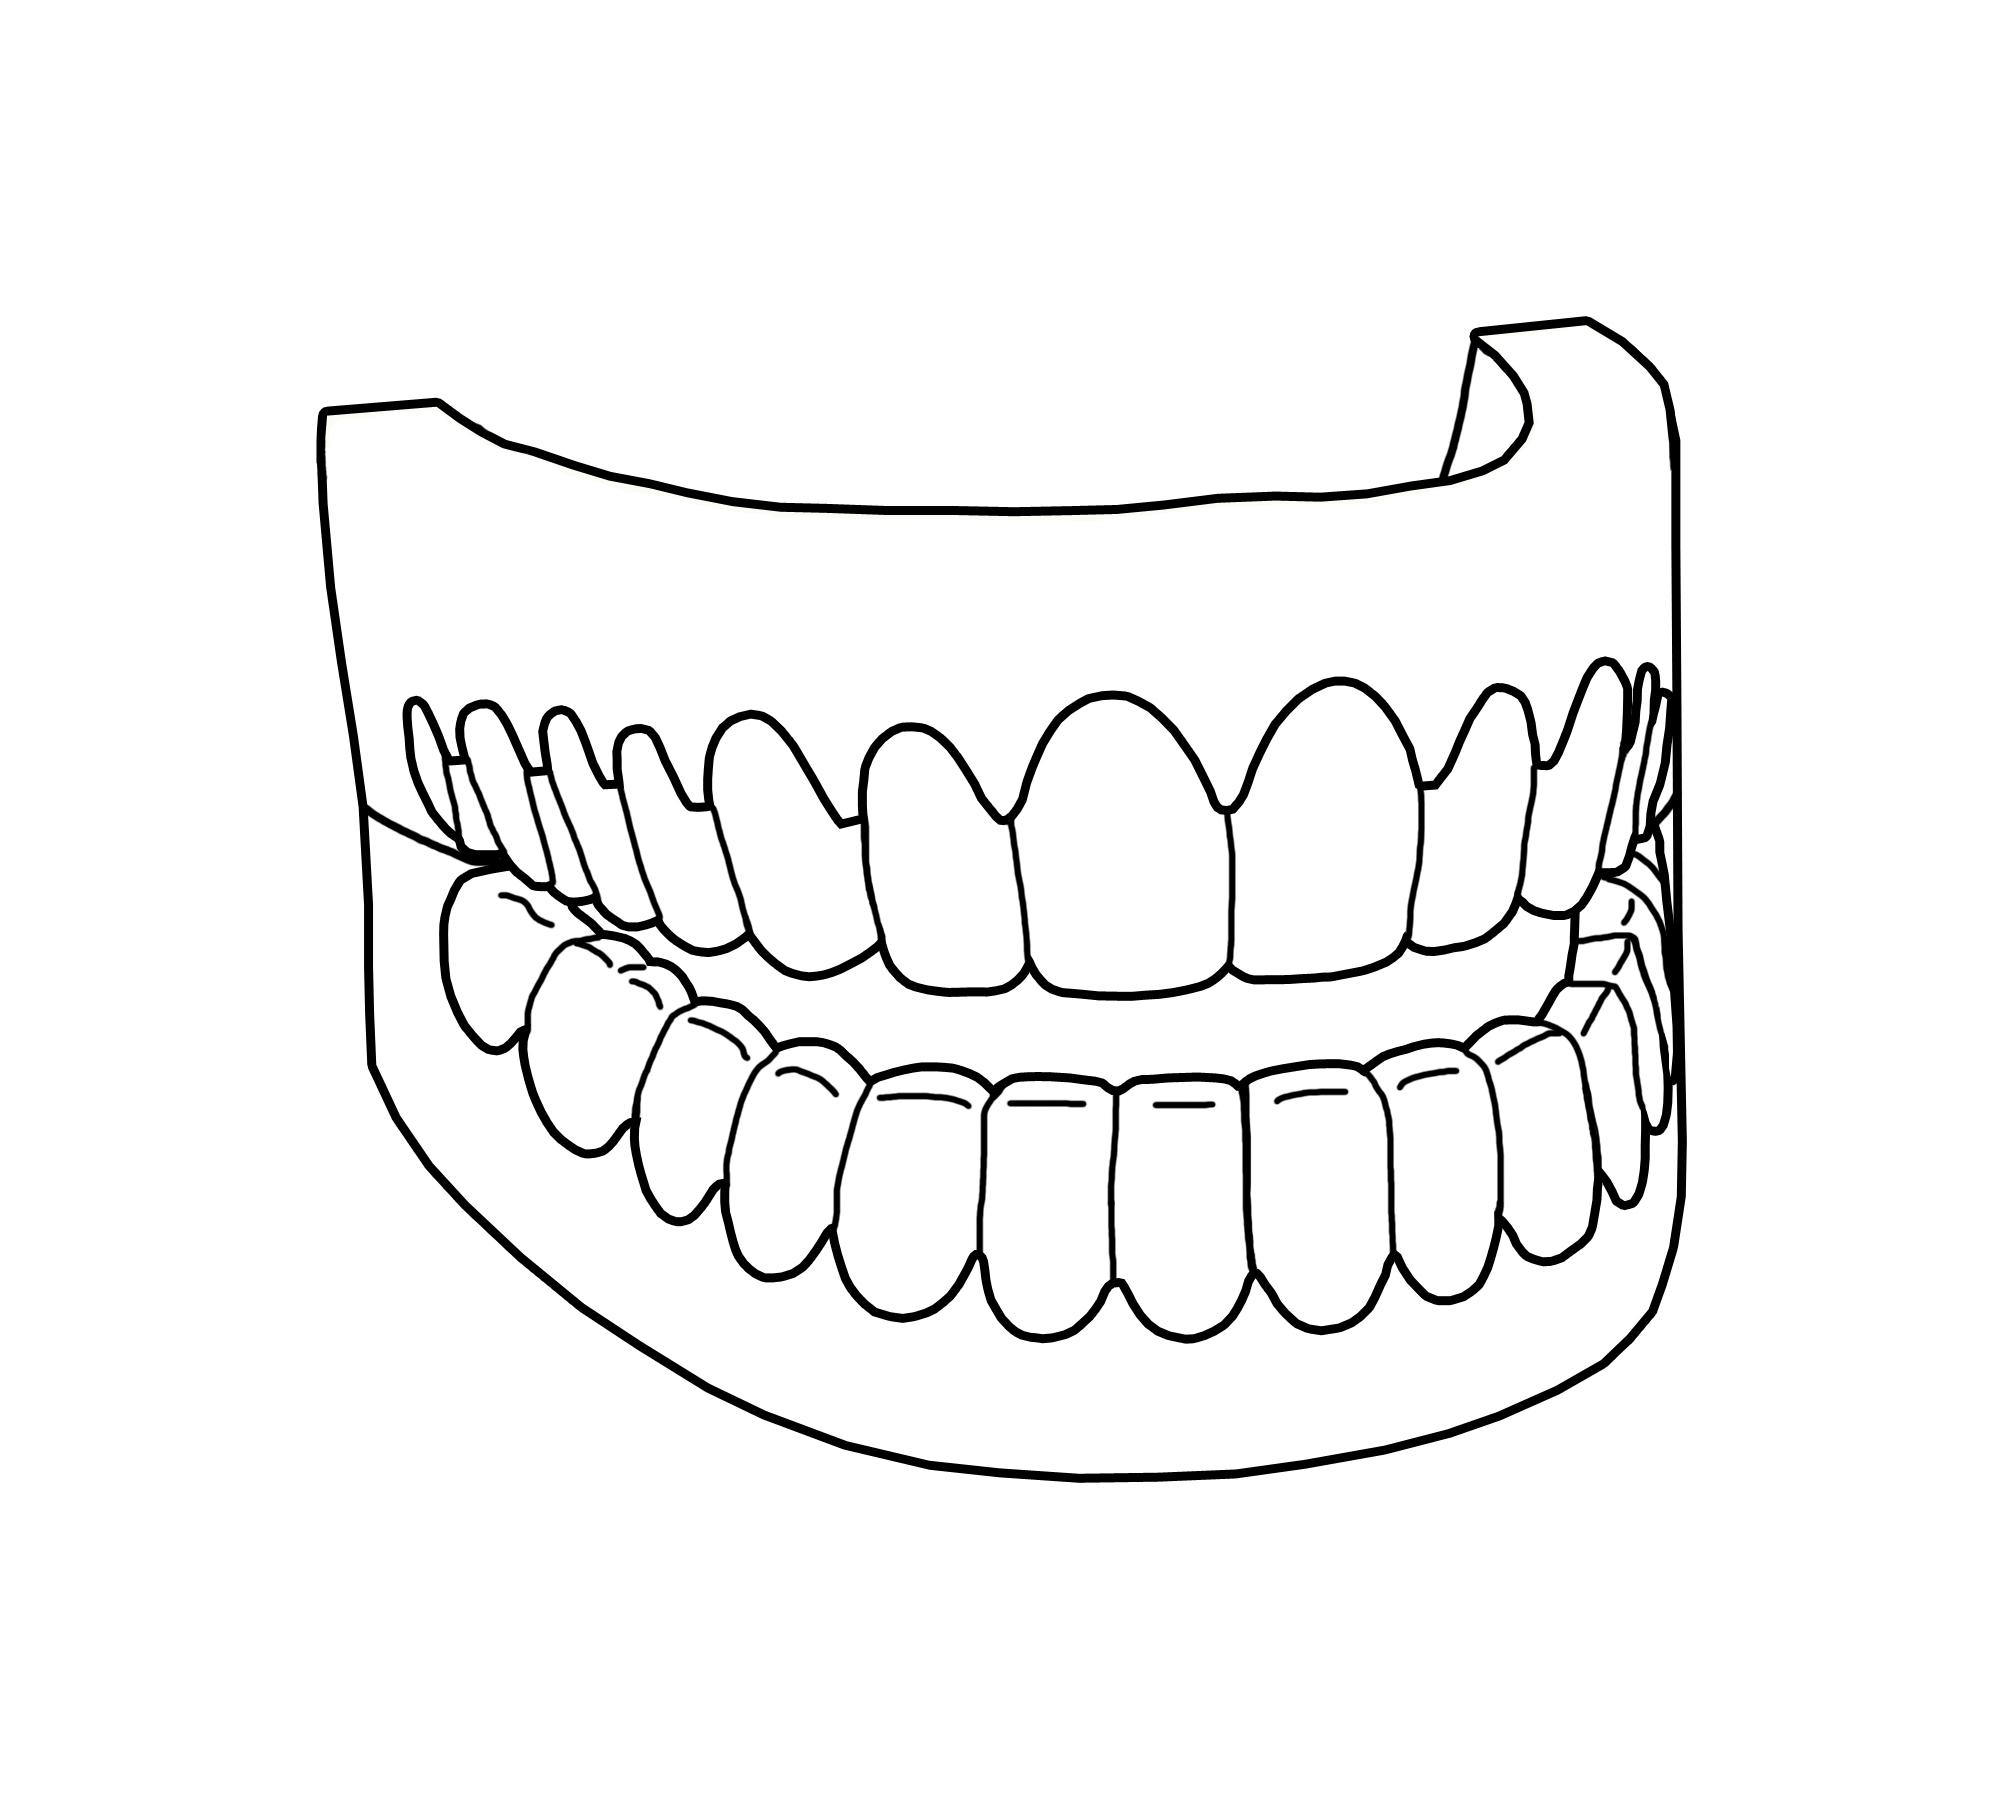 Human Teeth Drawing At Getdrawings Free For Personal Use Human